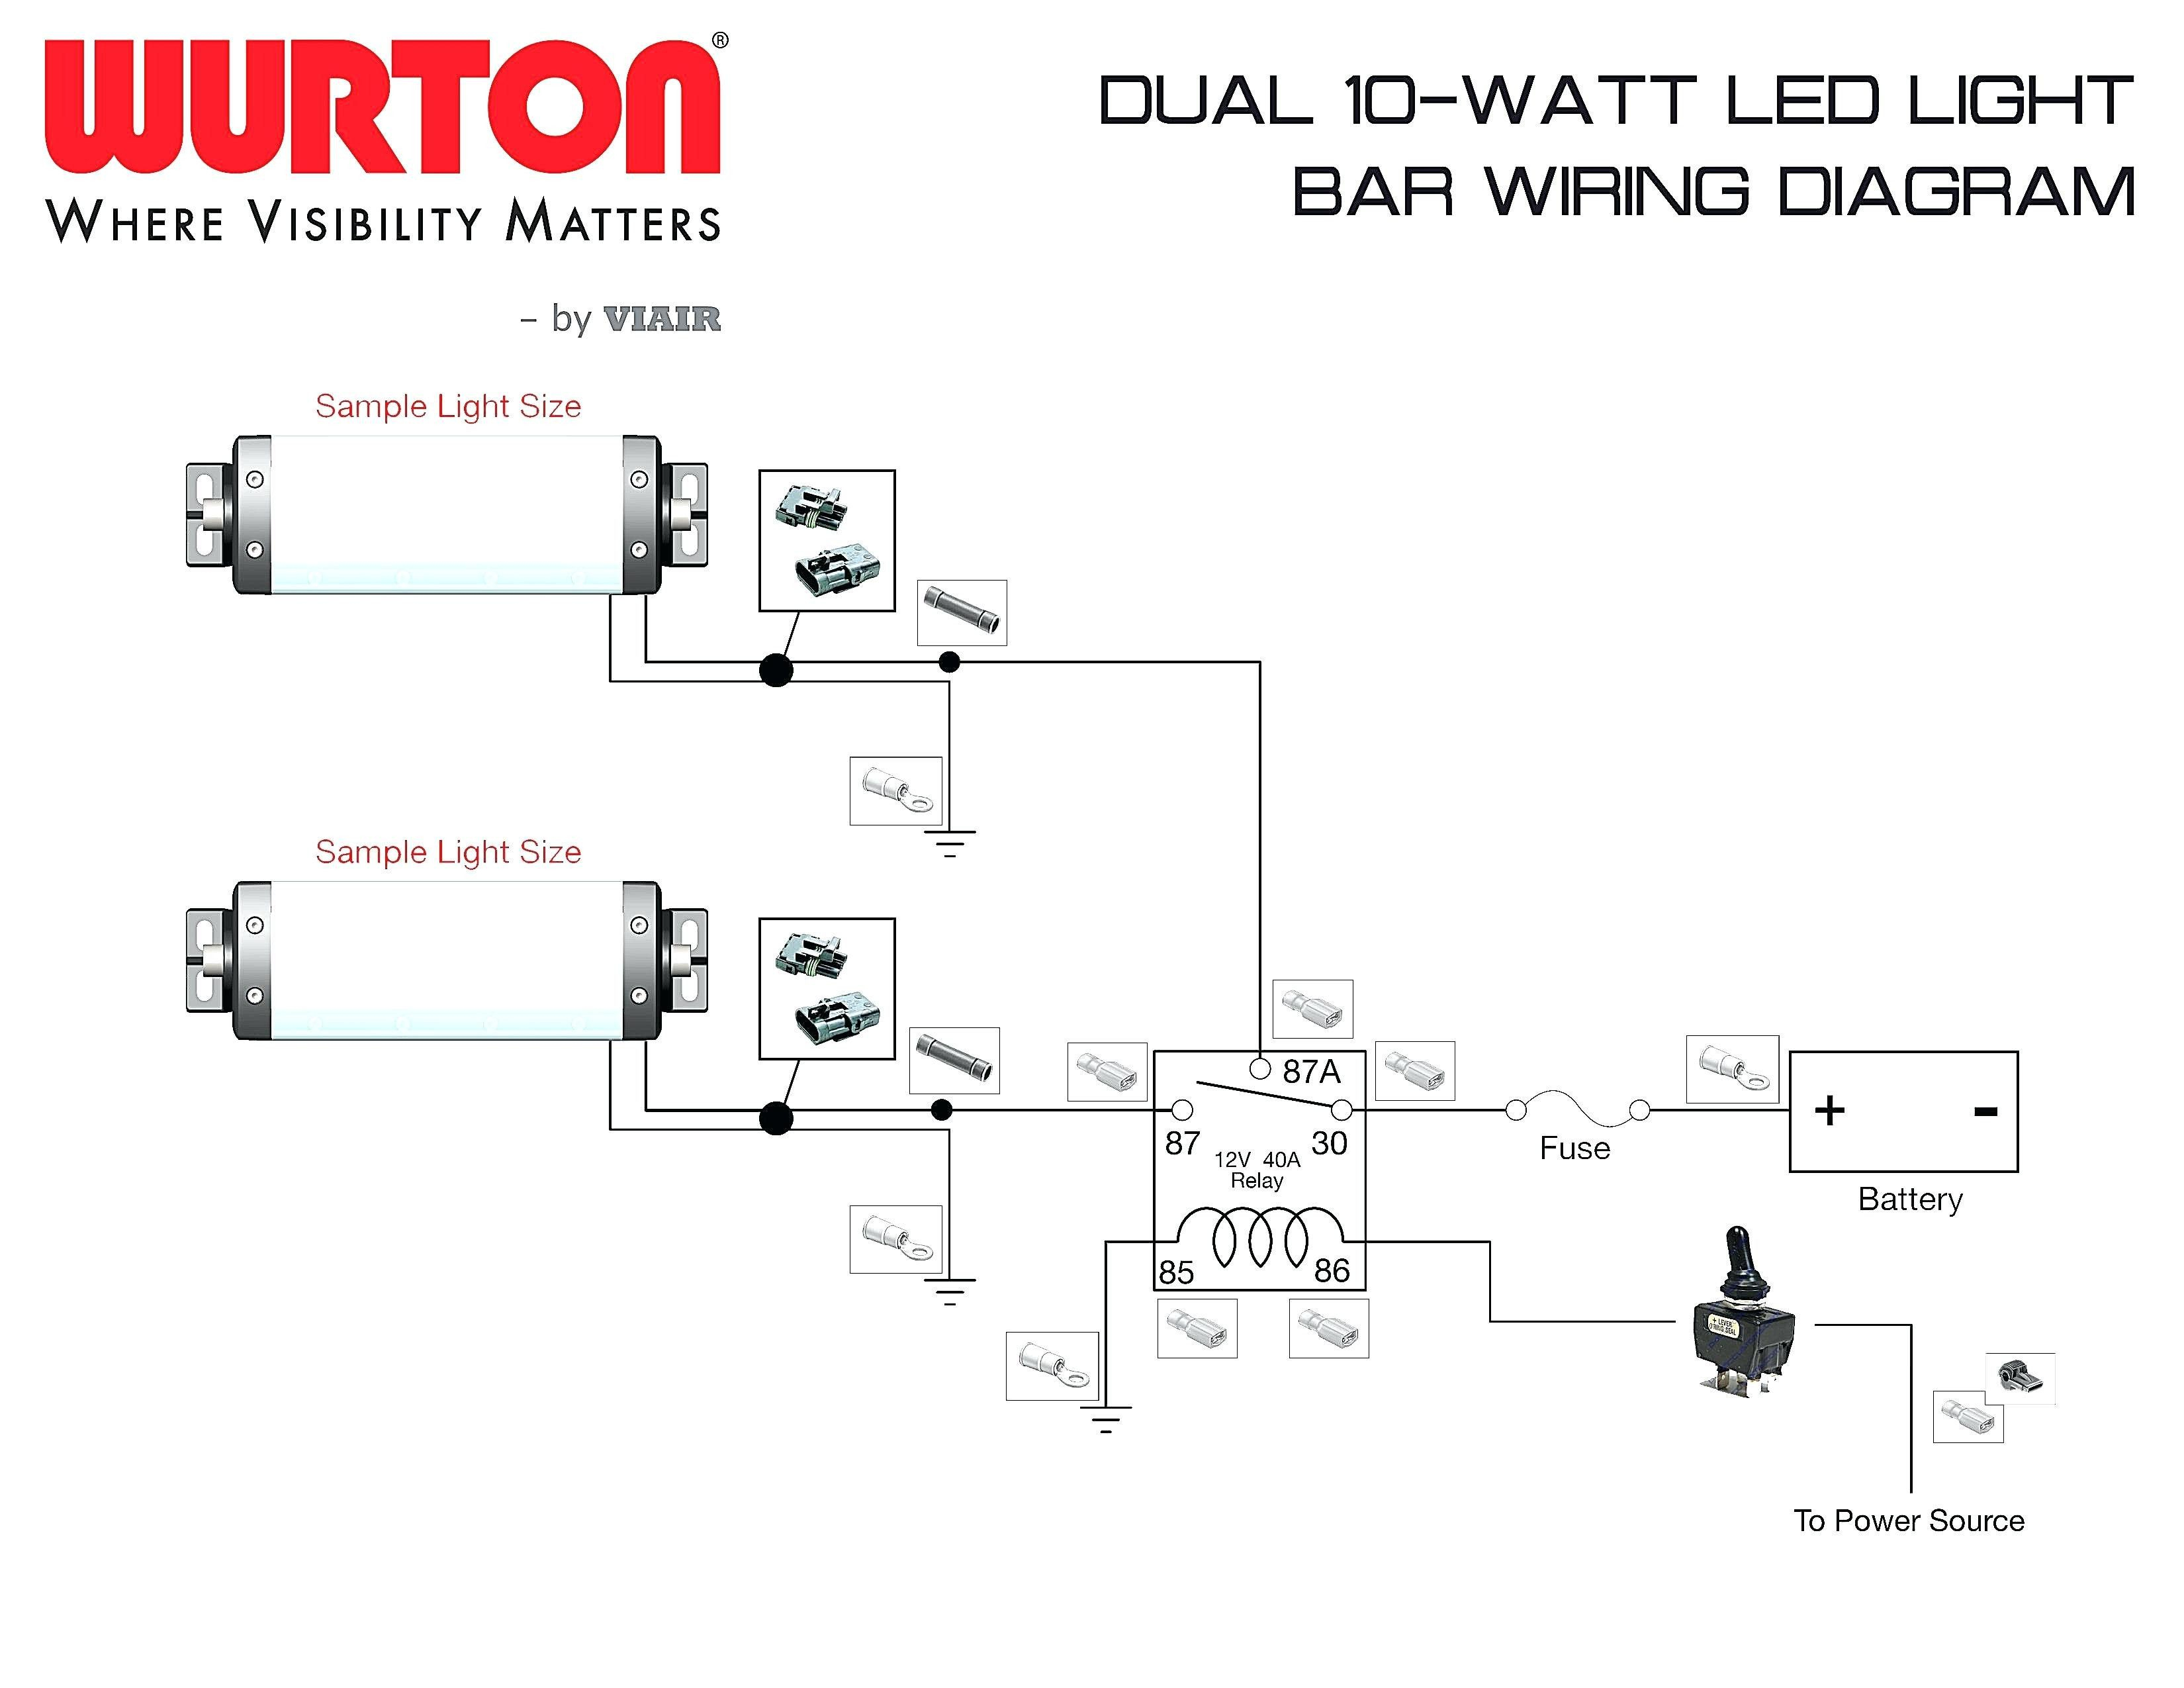 Gm Fuel Sending Unit Wiring Diagram Best Of Wiring Diagram For Fuel - Gm Fuel Sending Unit Wiring Diagram